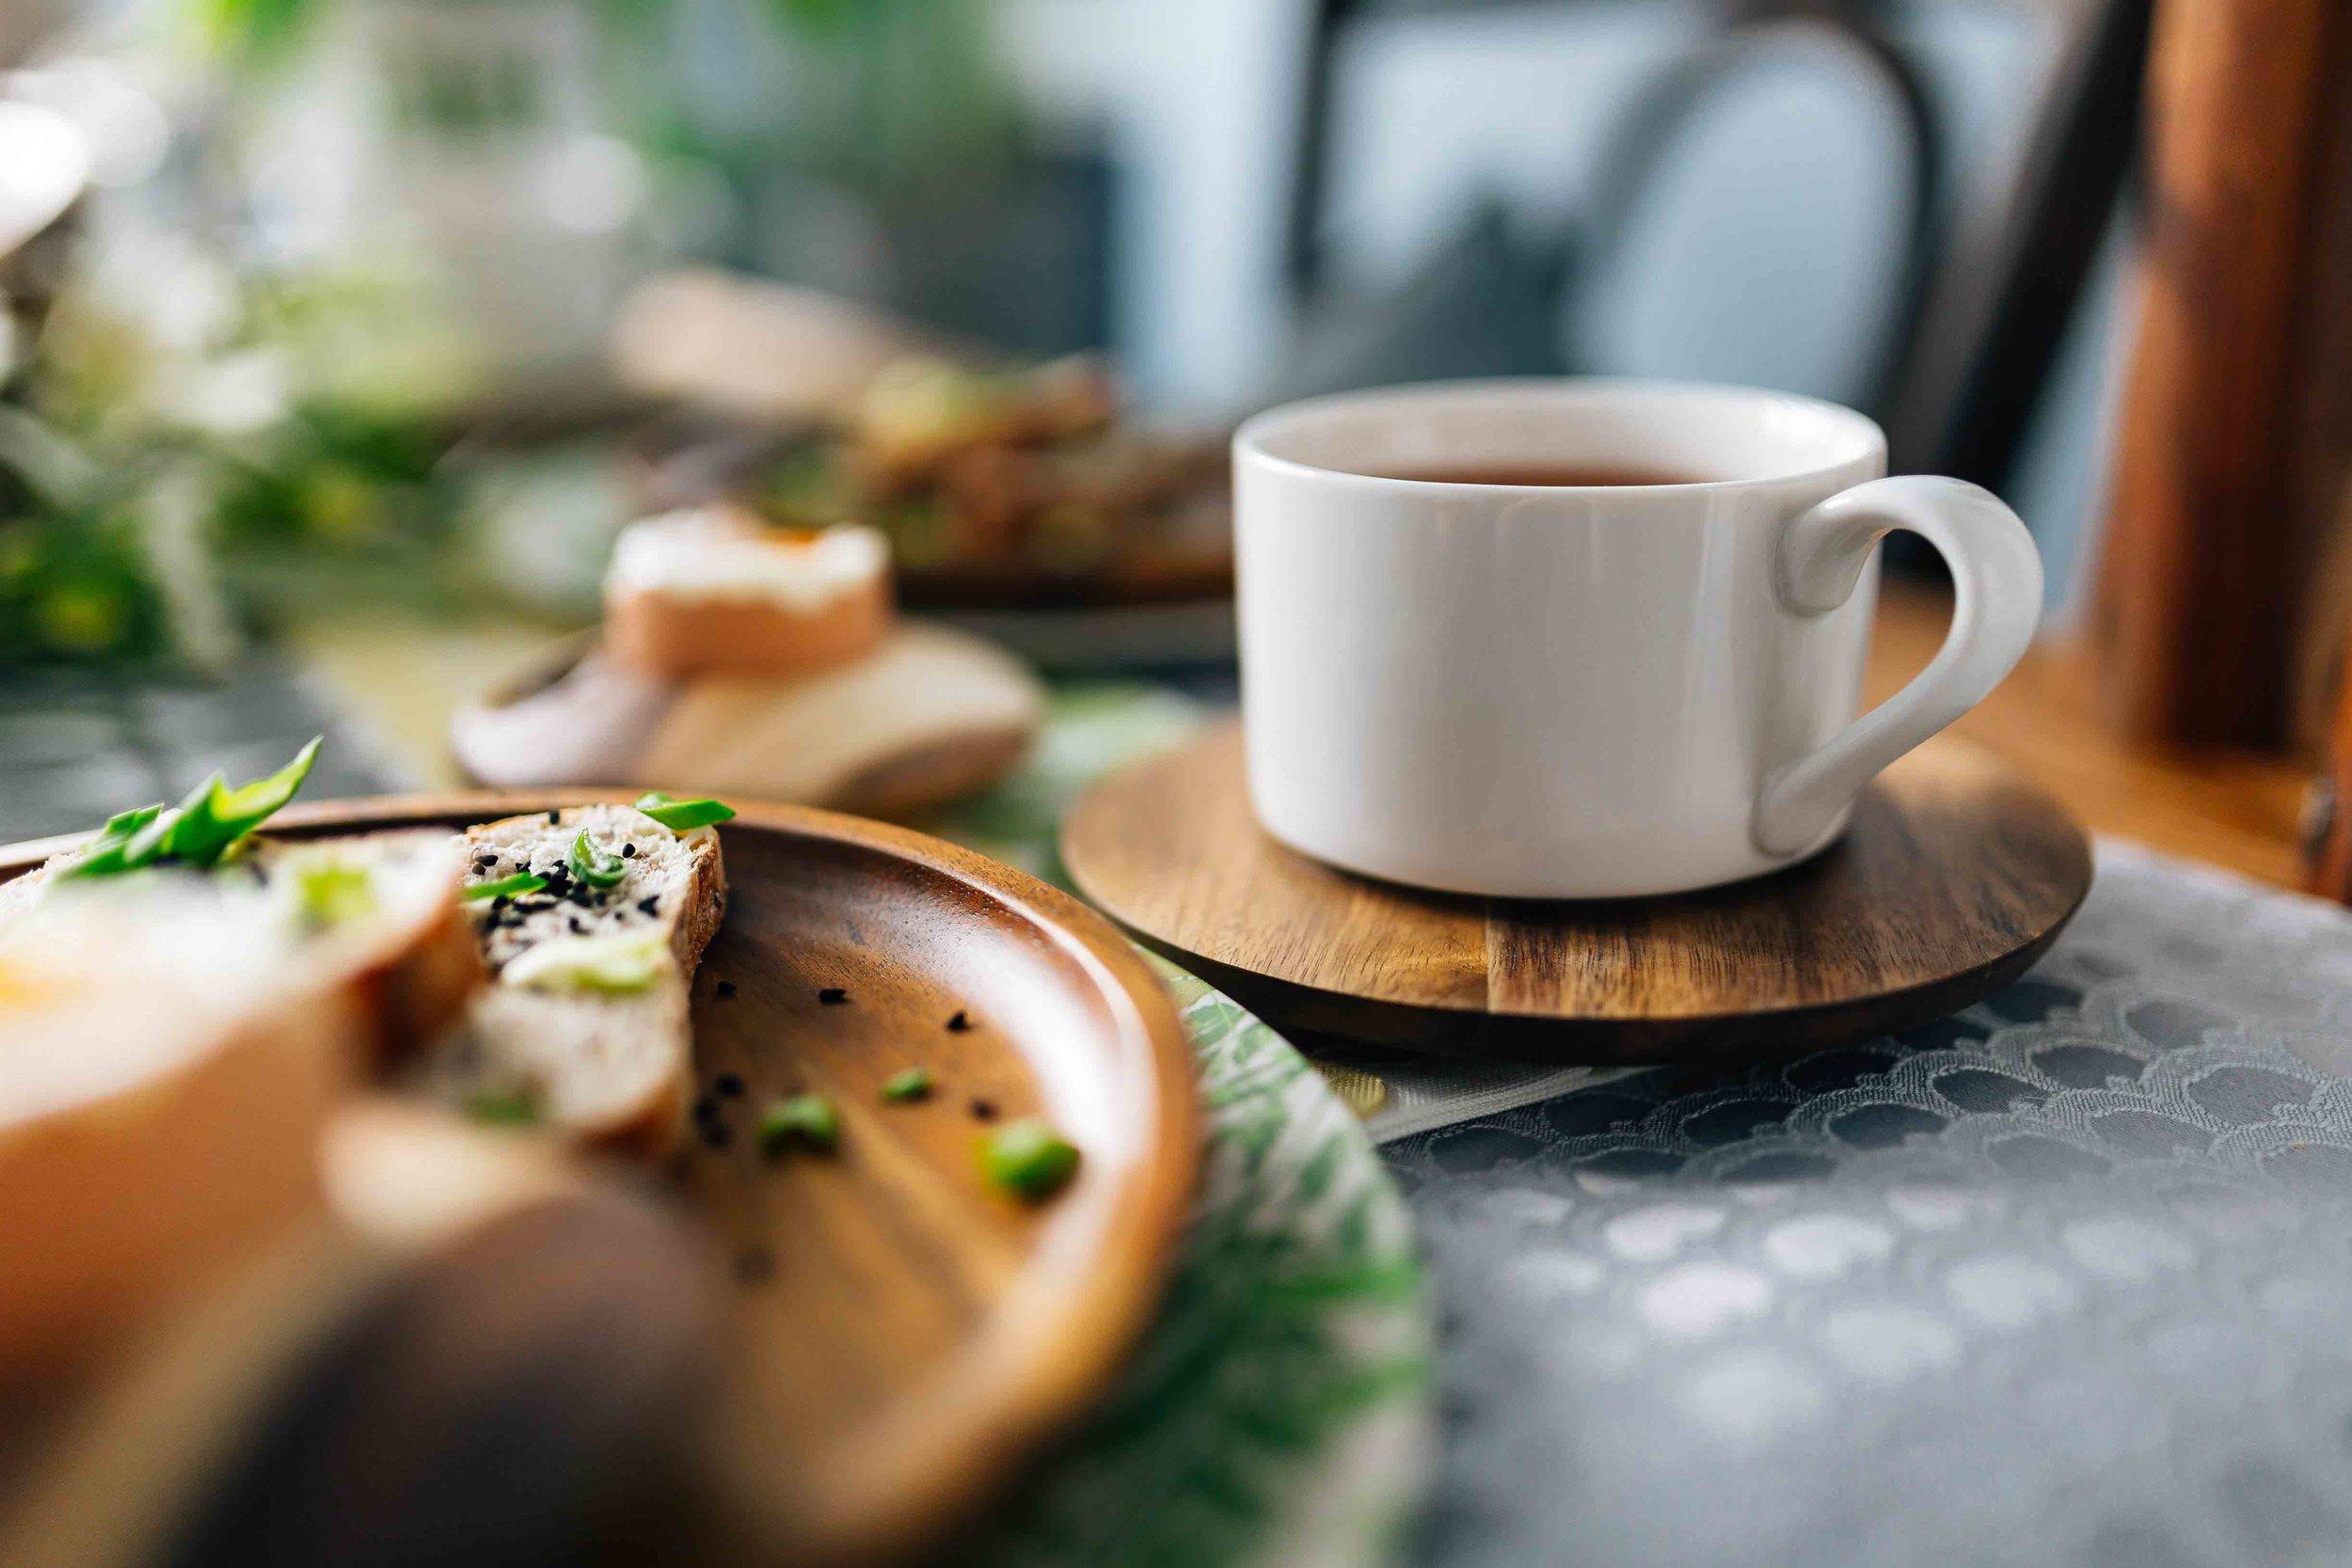 kaboompics_White cup with tea.jpg